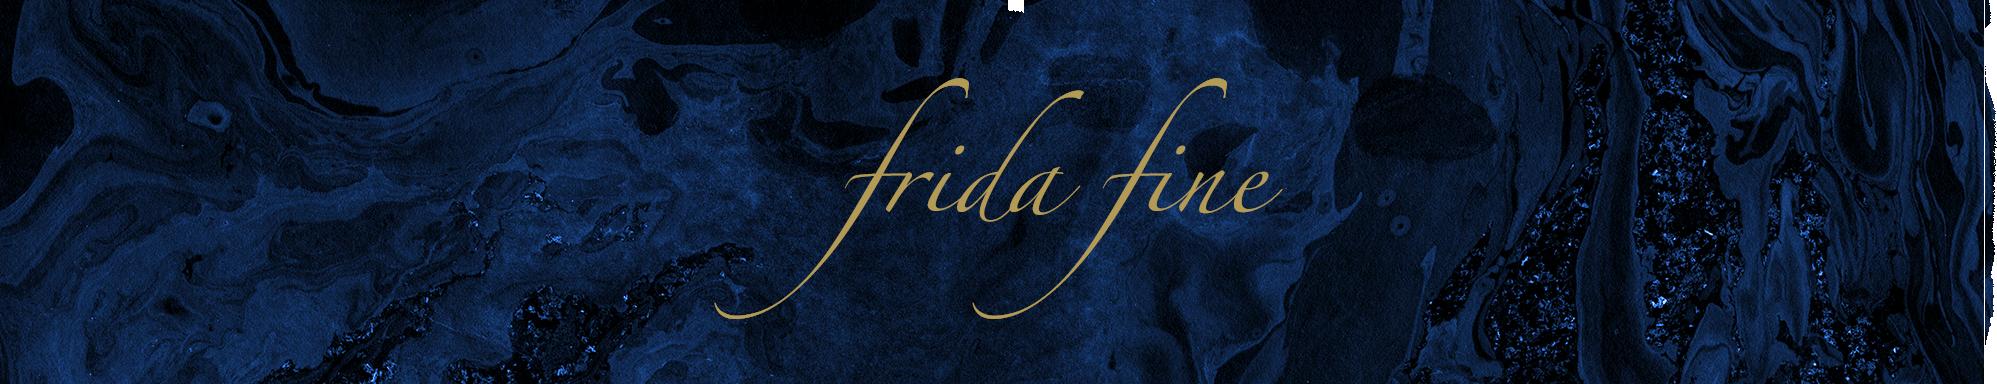 FRIDA. Frida Fine Banner.